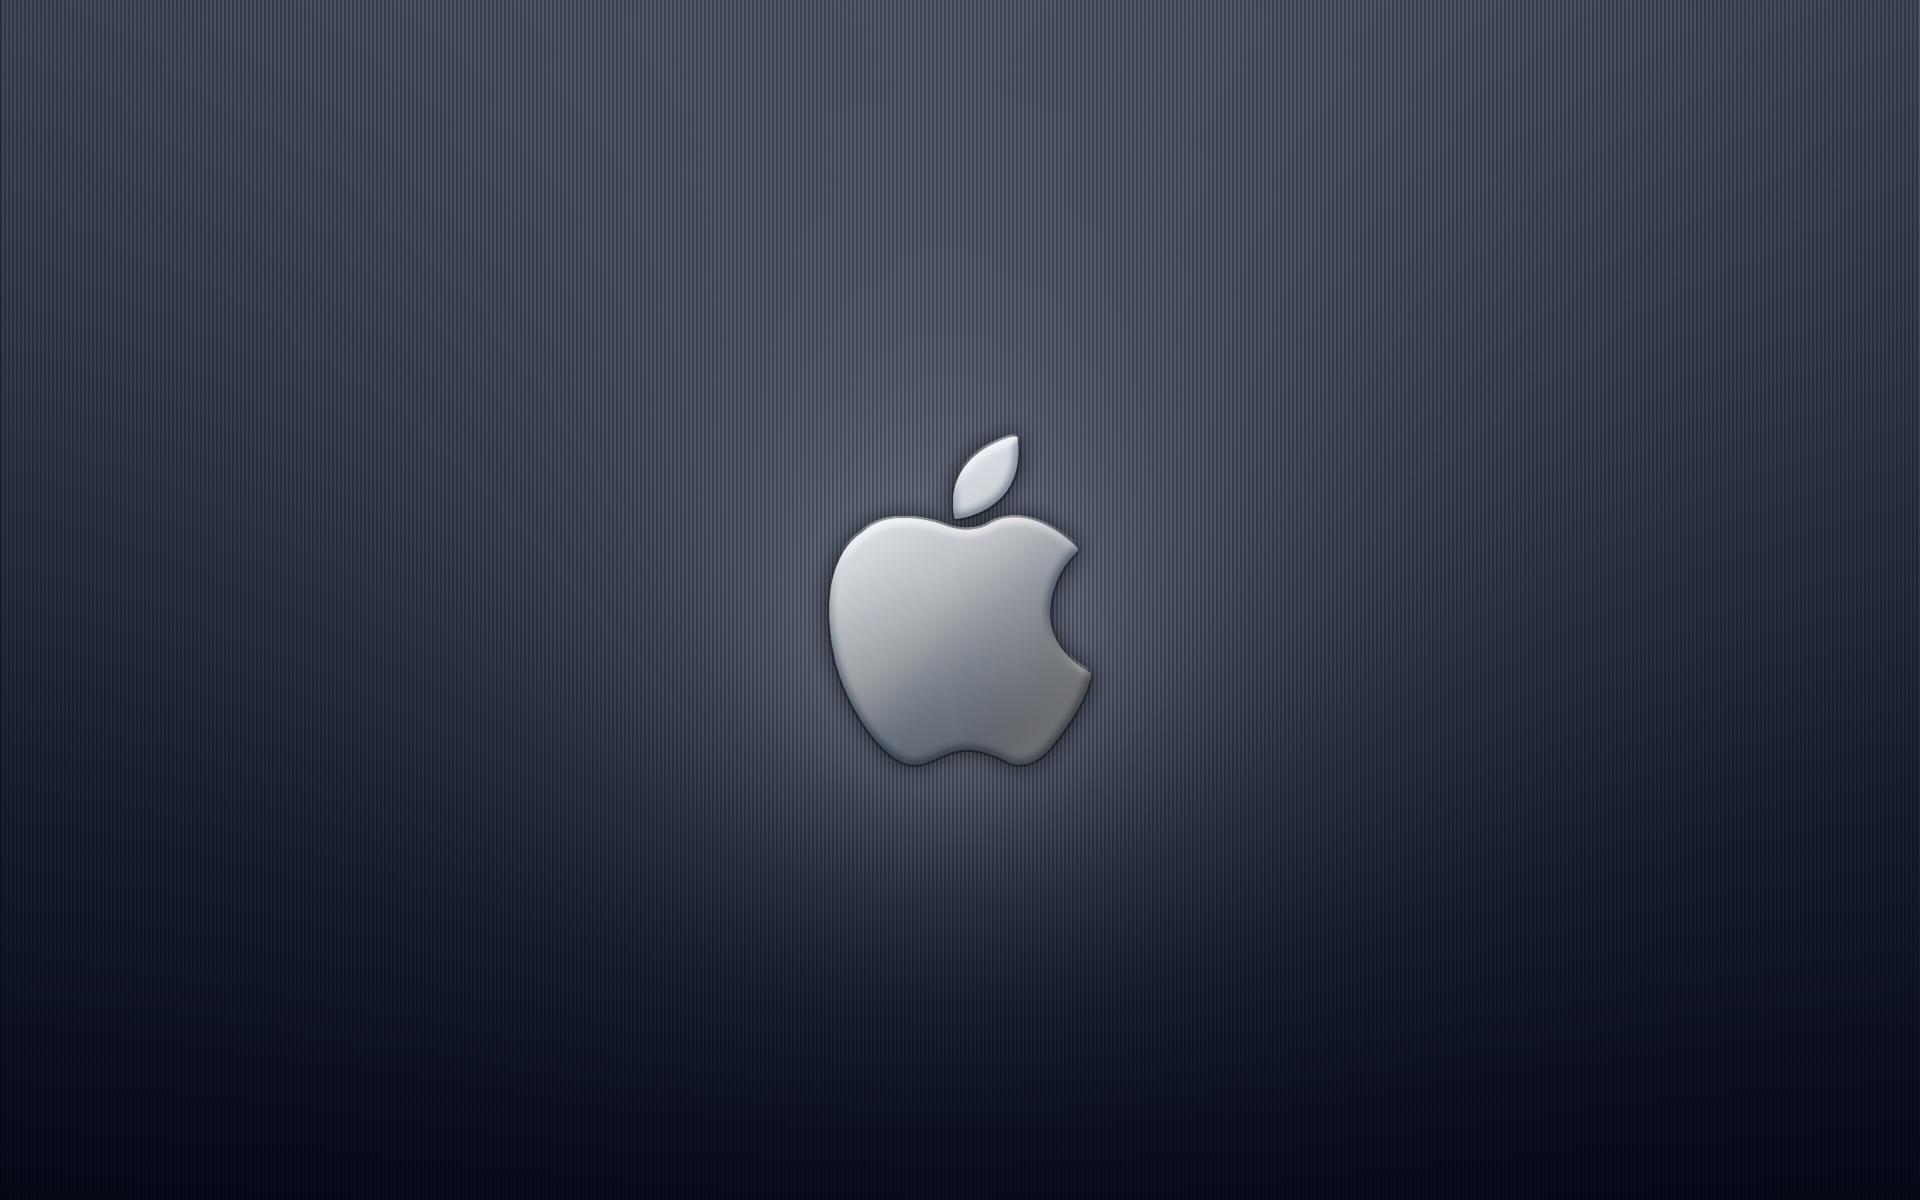 Apple BG by Blodigel